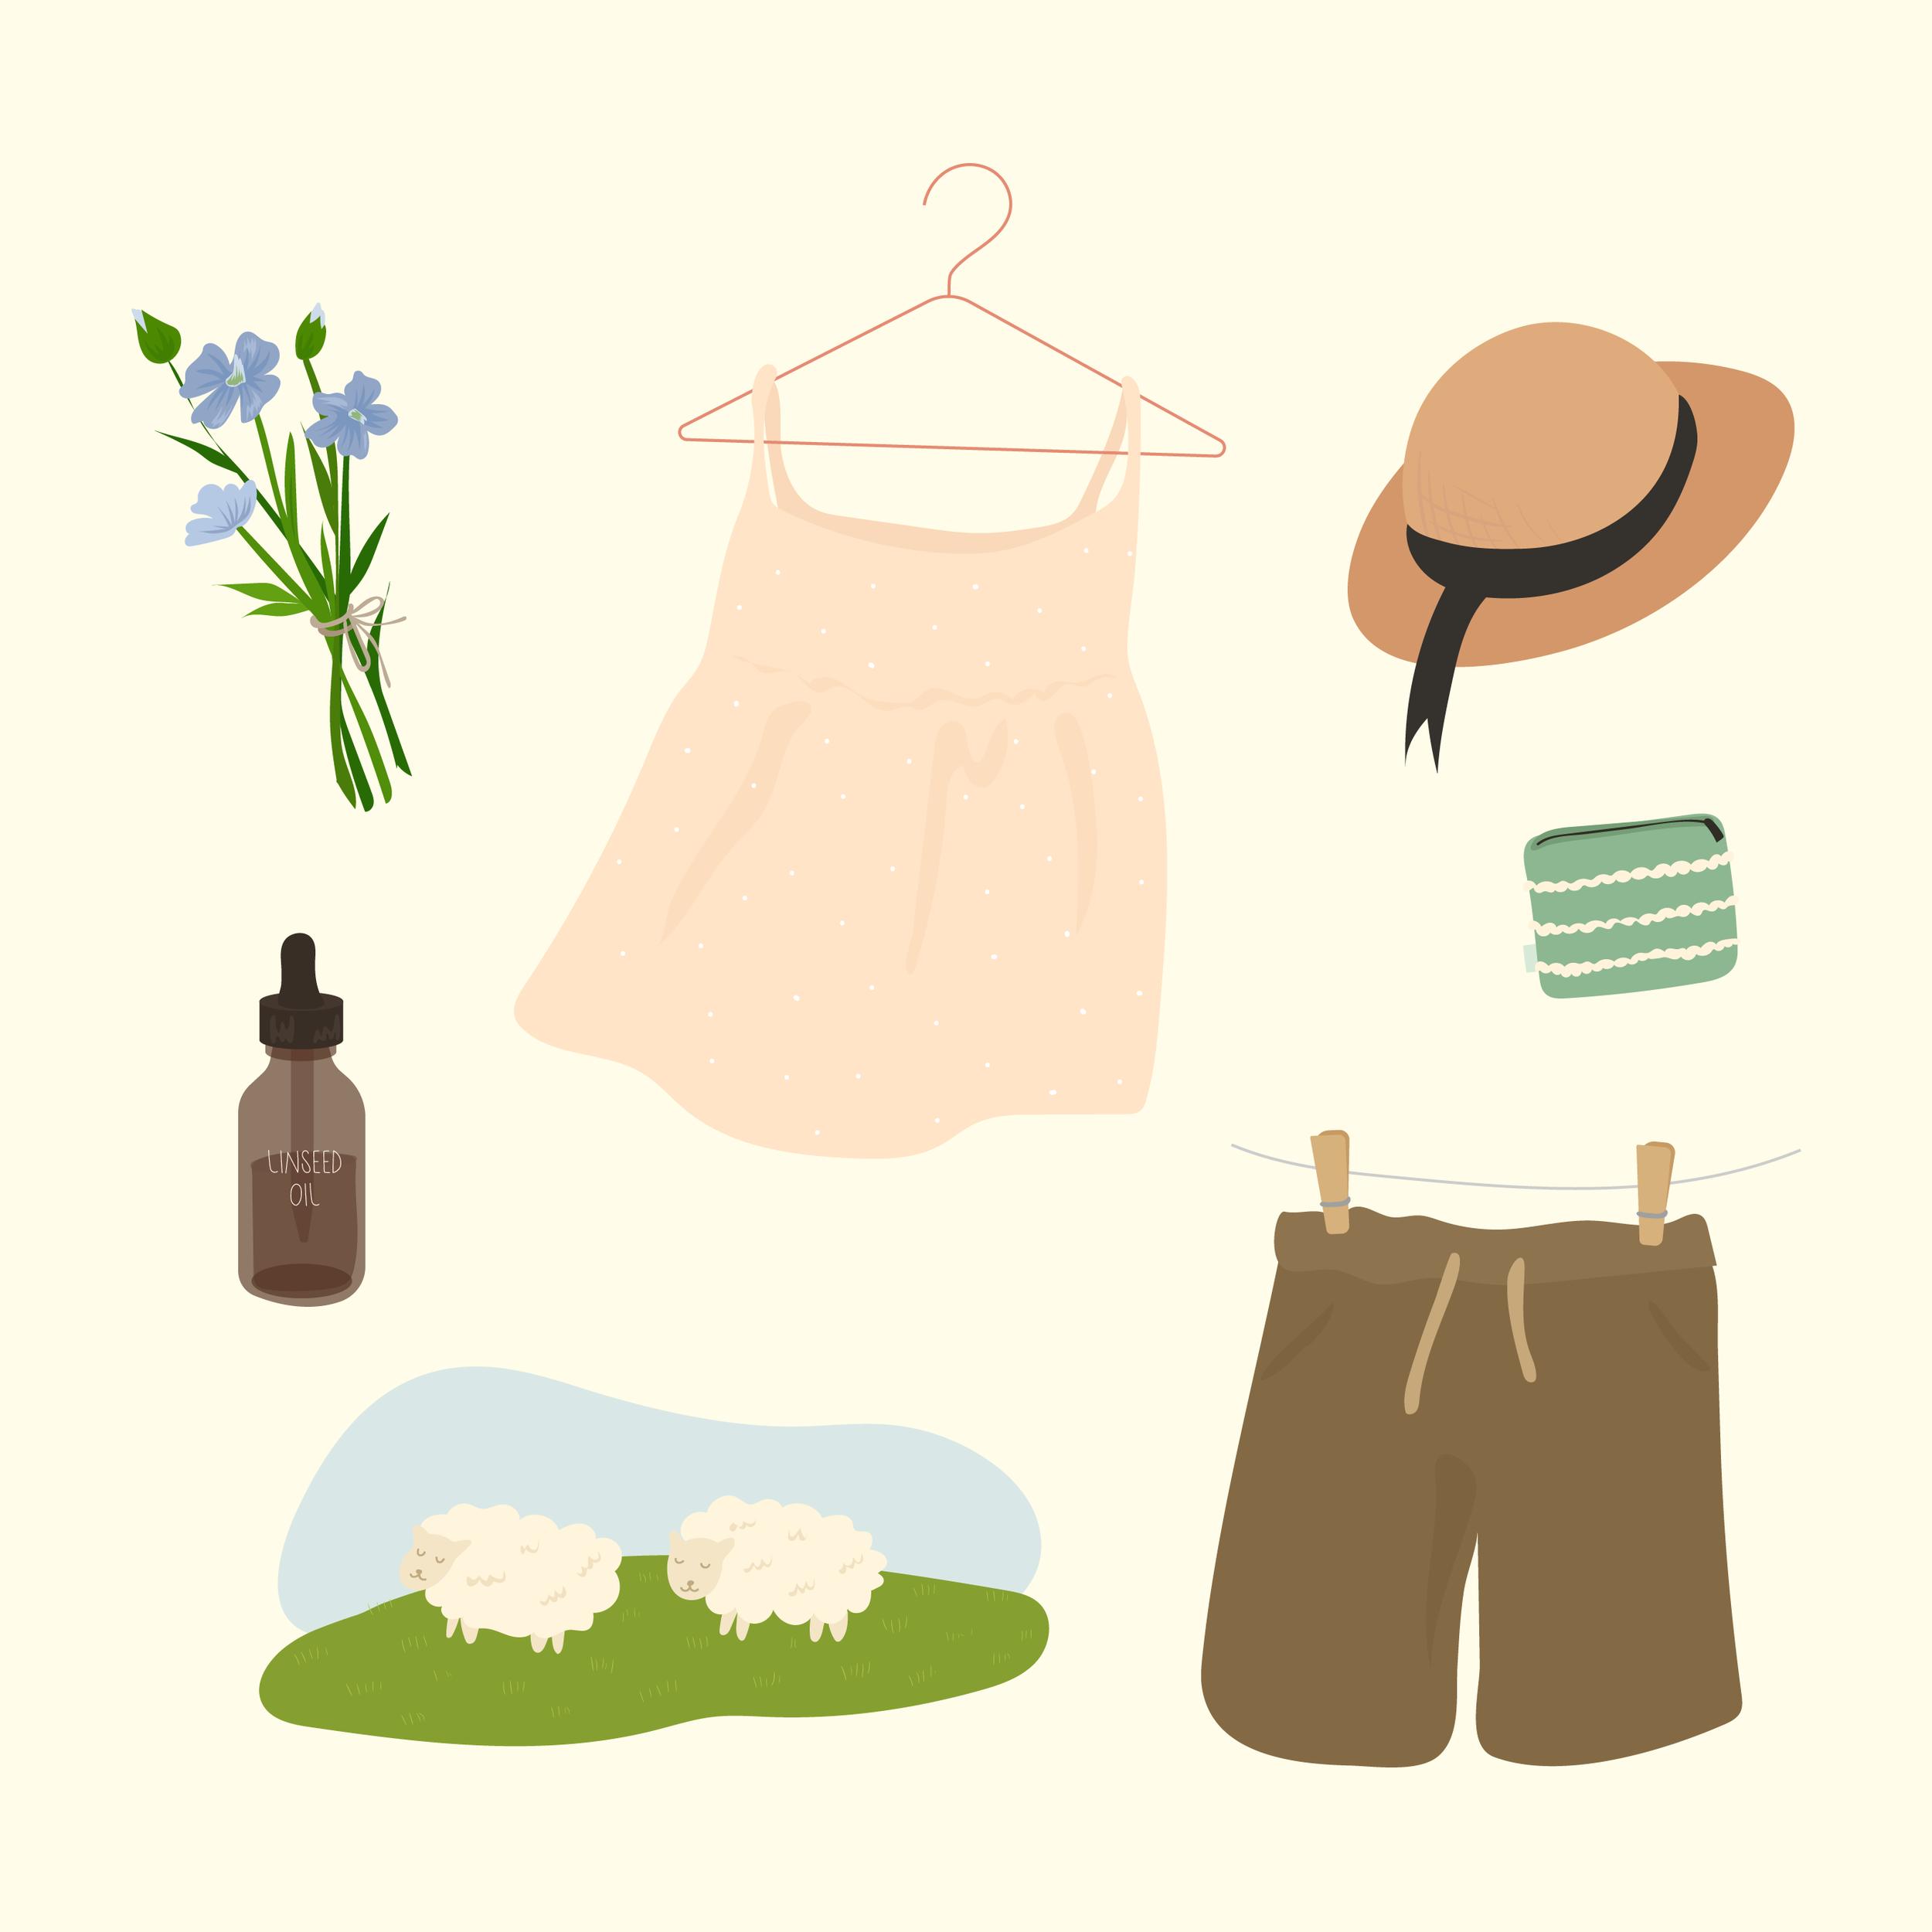 Youheum Son_Sustainability fabrics, fibers, and facts_Sustain Magazine-03.png